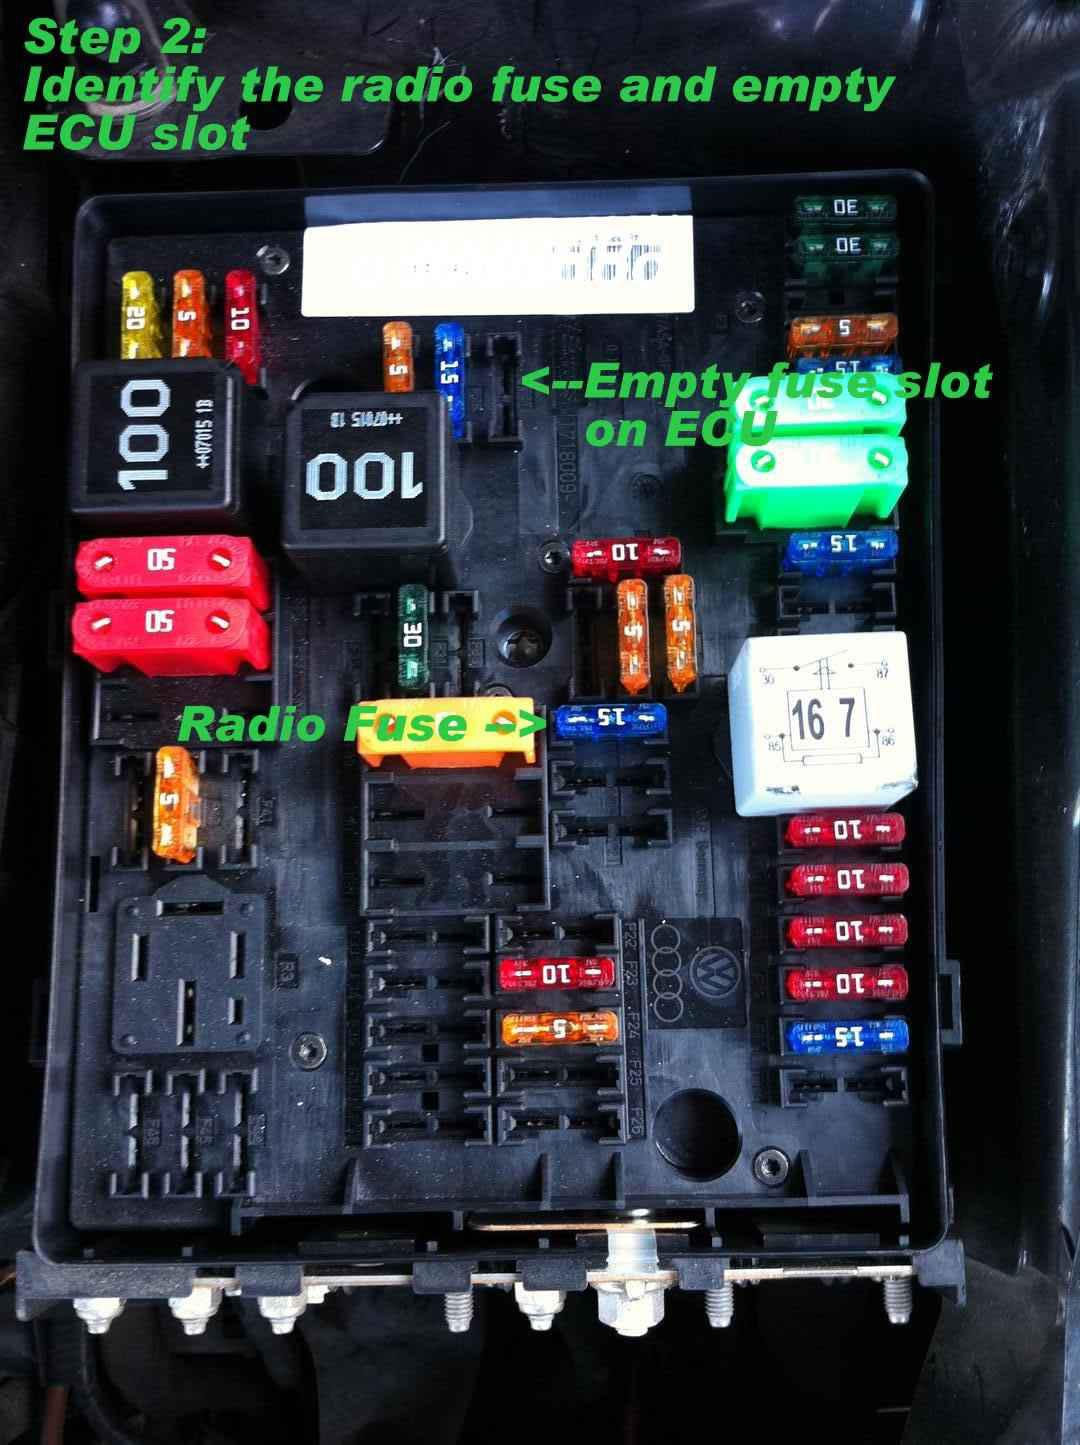 2010 Volkswagen Tiguan Fuse Box Diagram Montage Autoradio Gps Audio Amp 233 Lectronique Embarqu 233 E